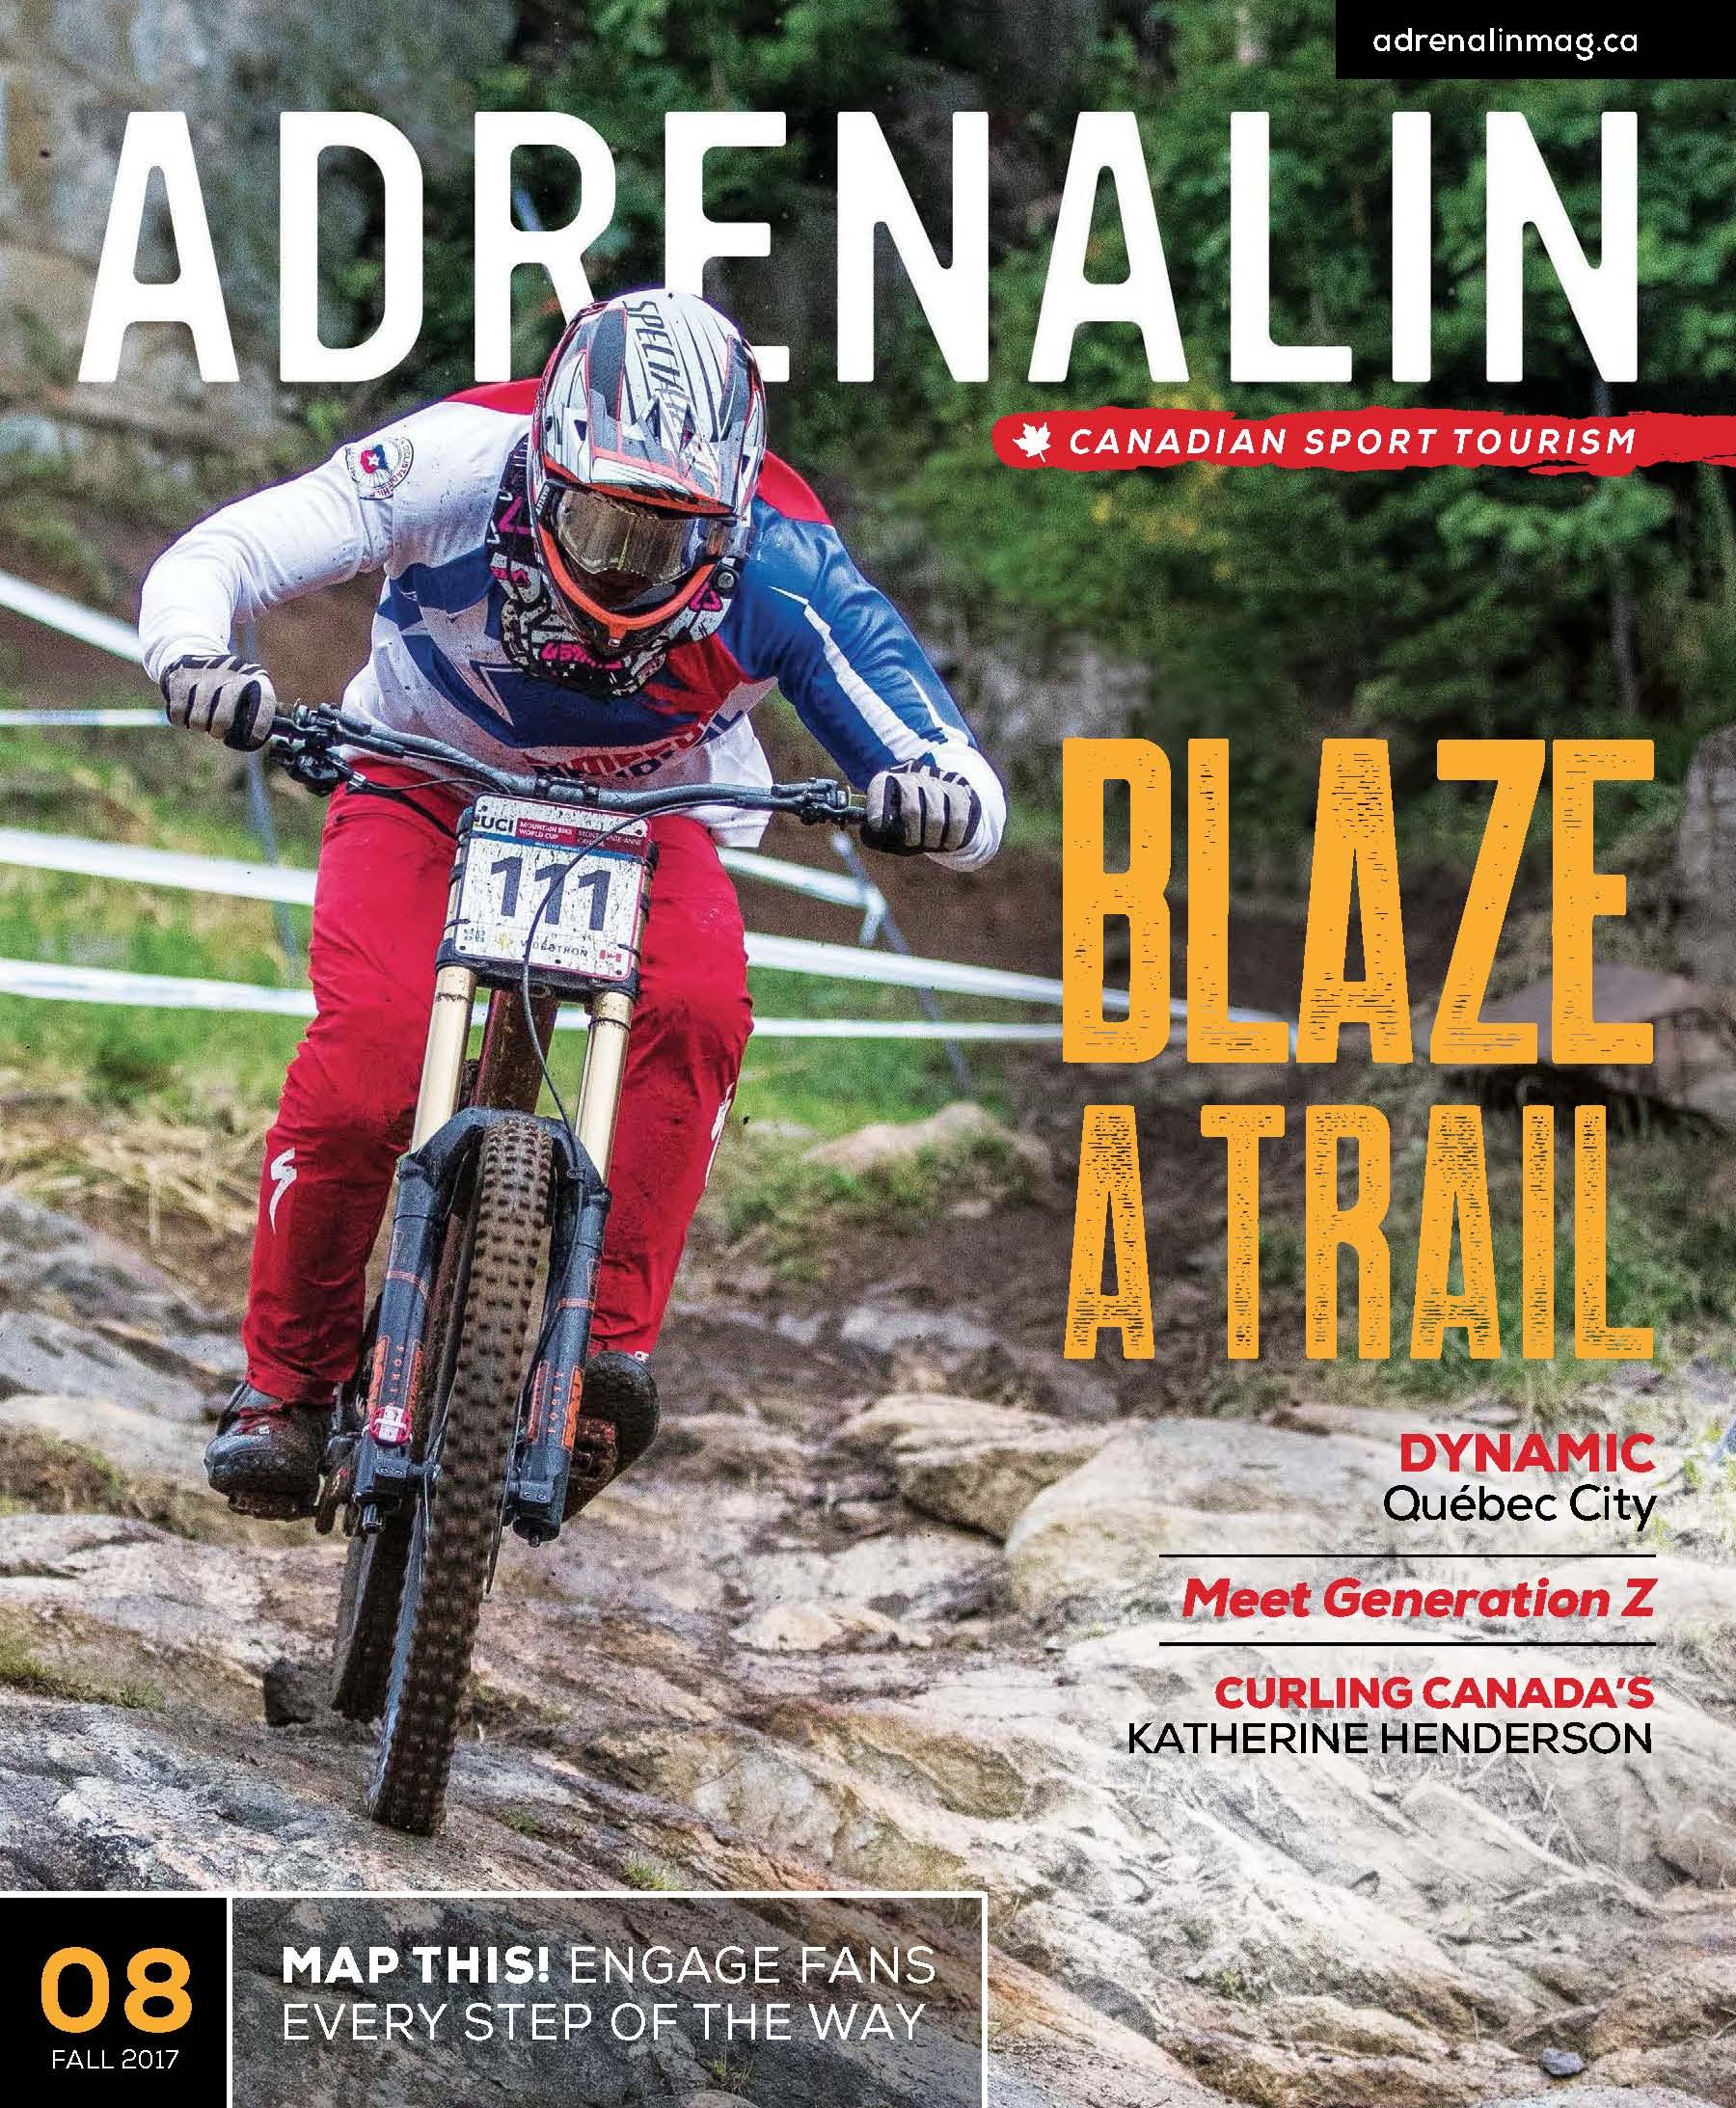 Cover adrenalin fall 2017